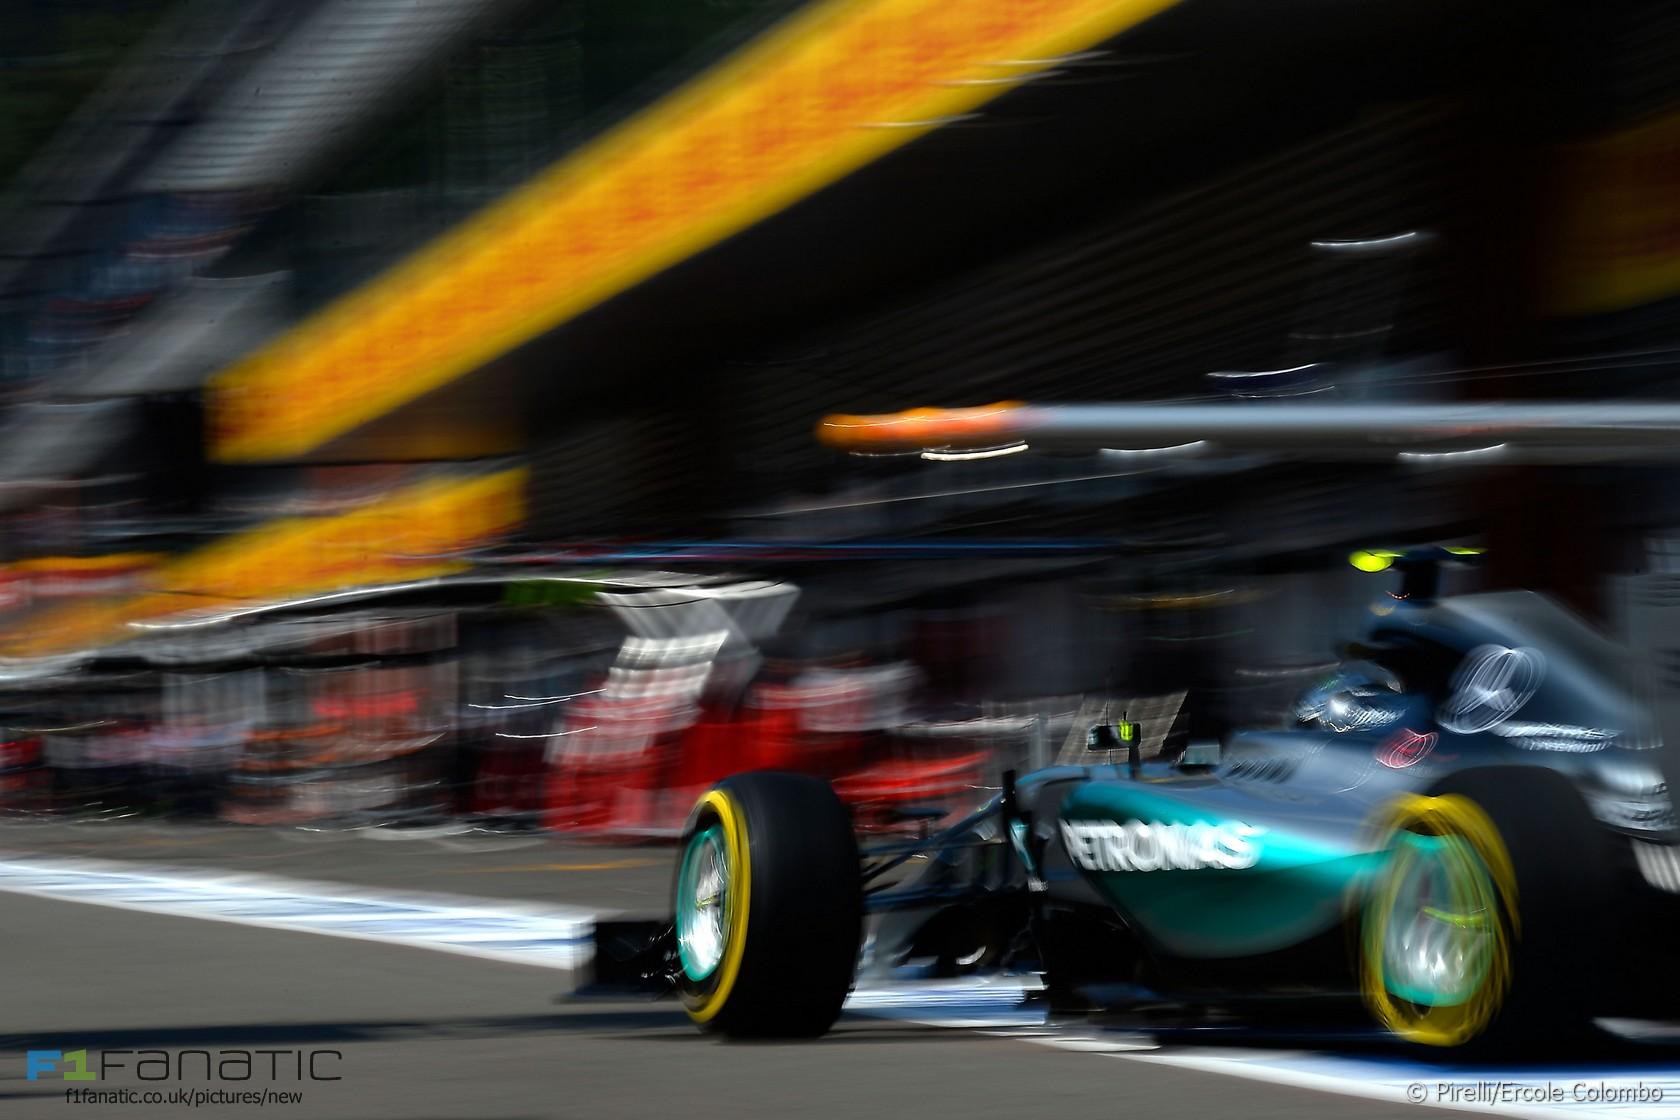 Nico Rosberg, Mercedes, Spa-Francorchamps, 2015